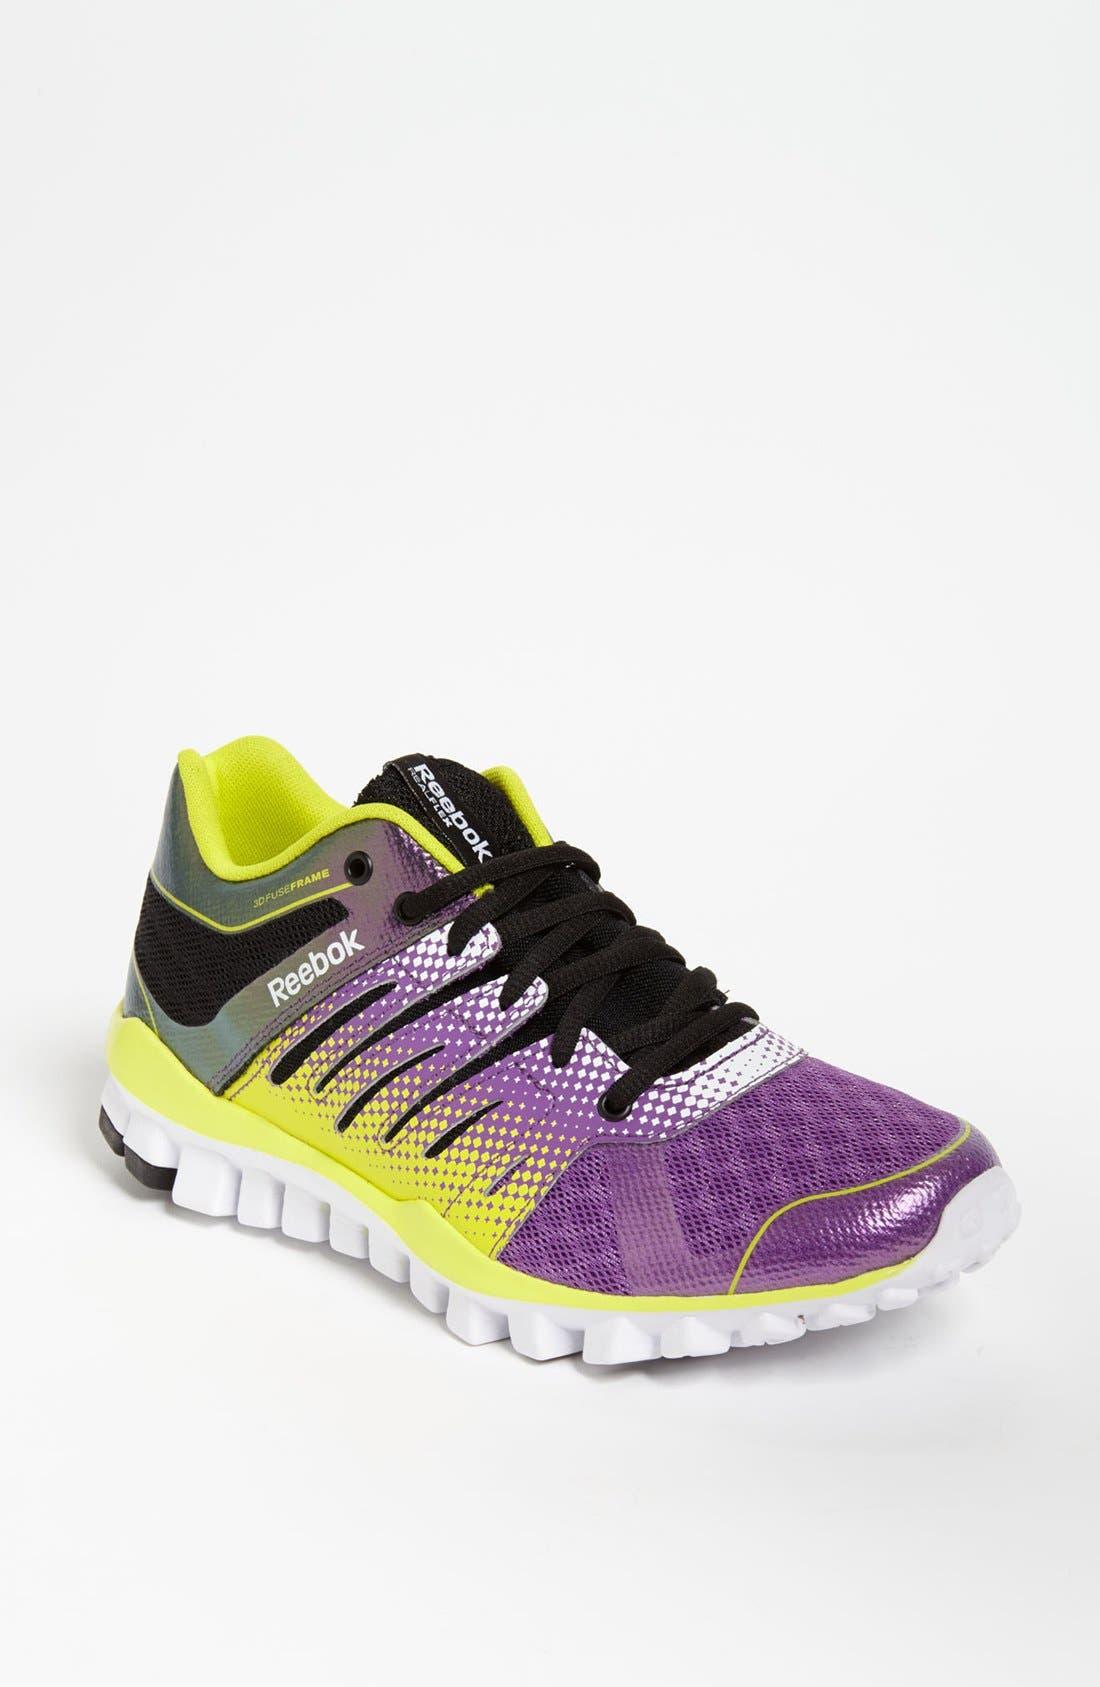 Alternate Image 1 Selected - Reebok 'RealFlex Strength' Training Shoe (Women)